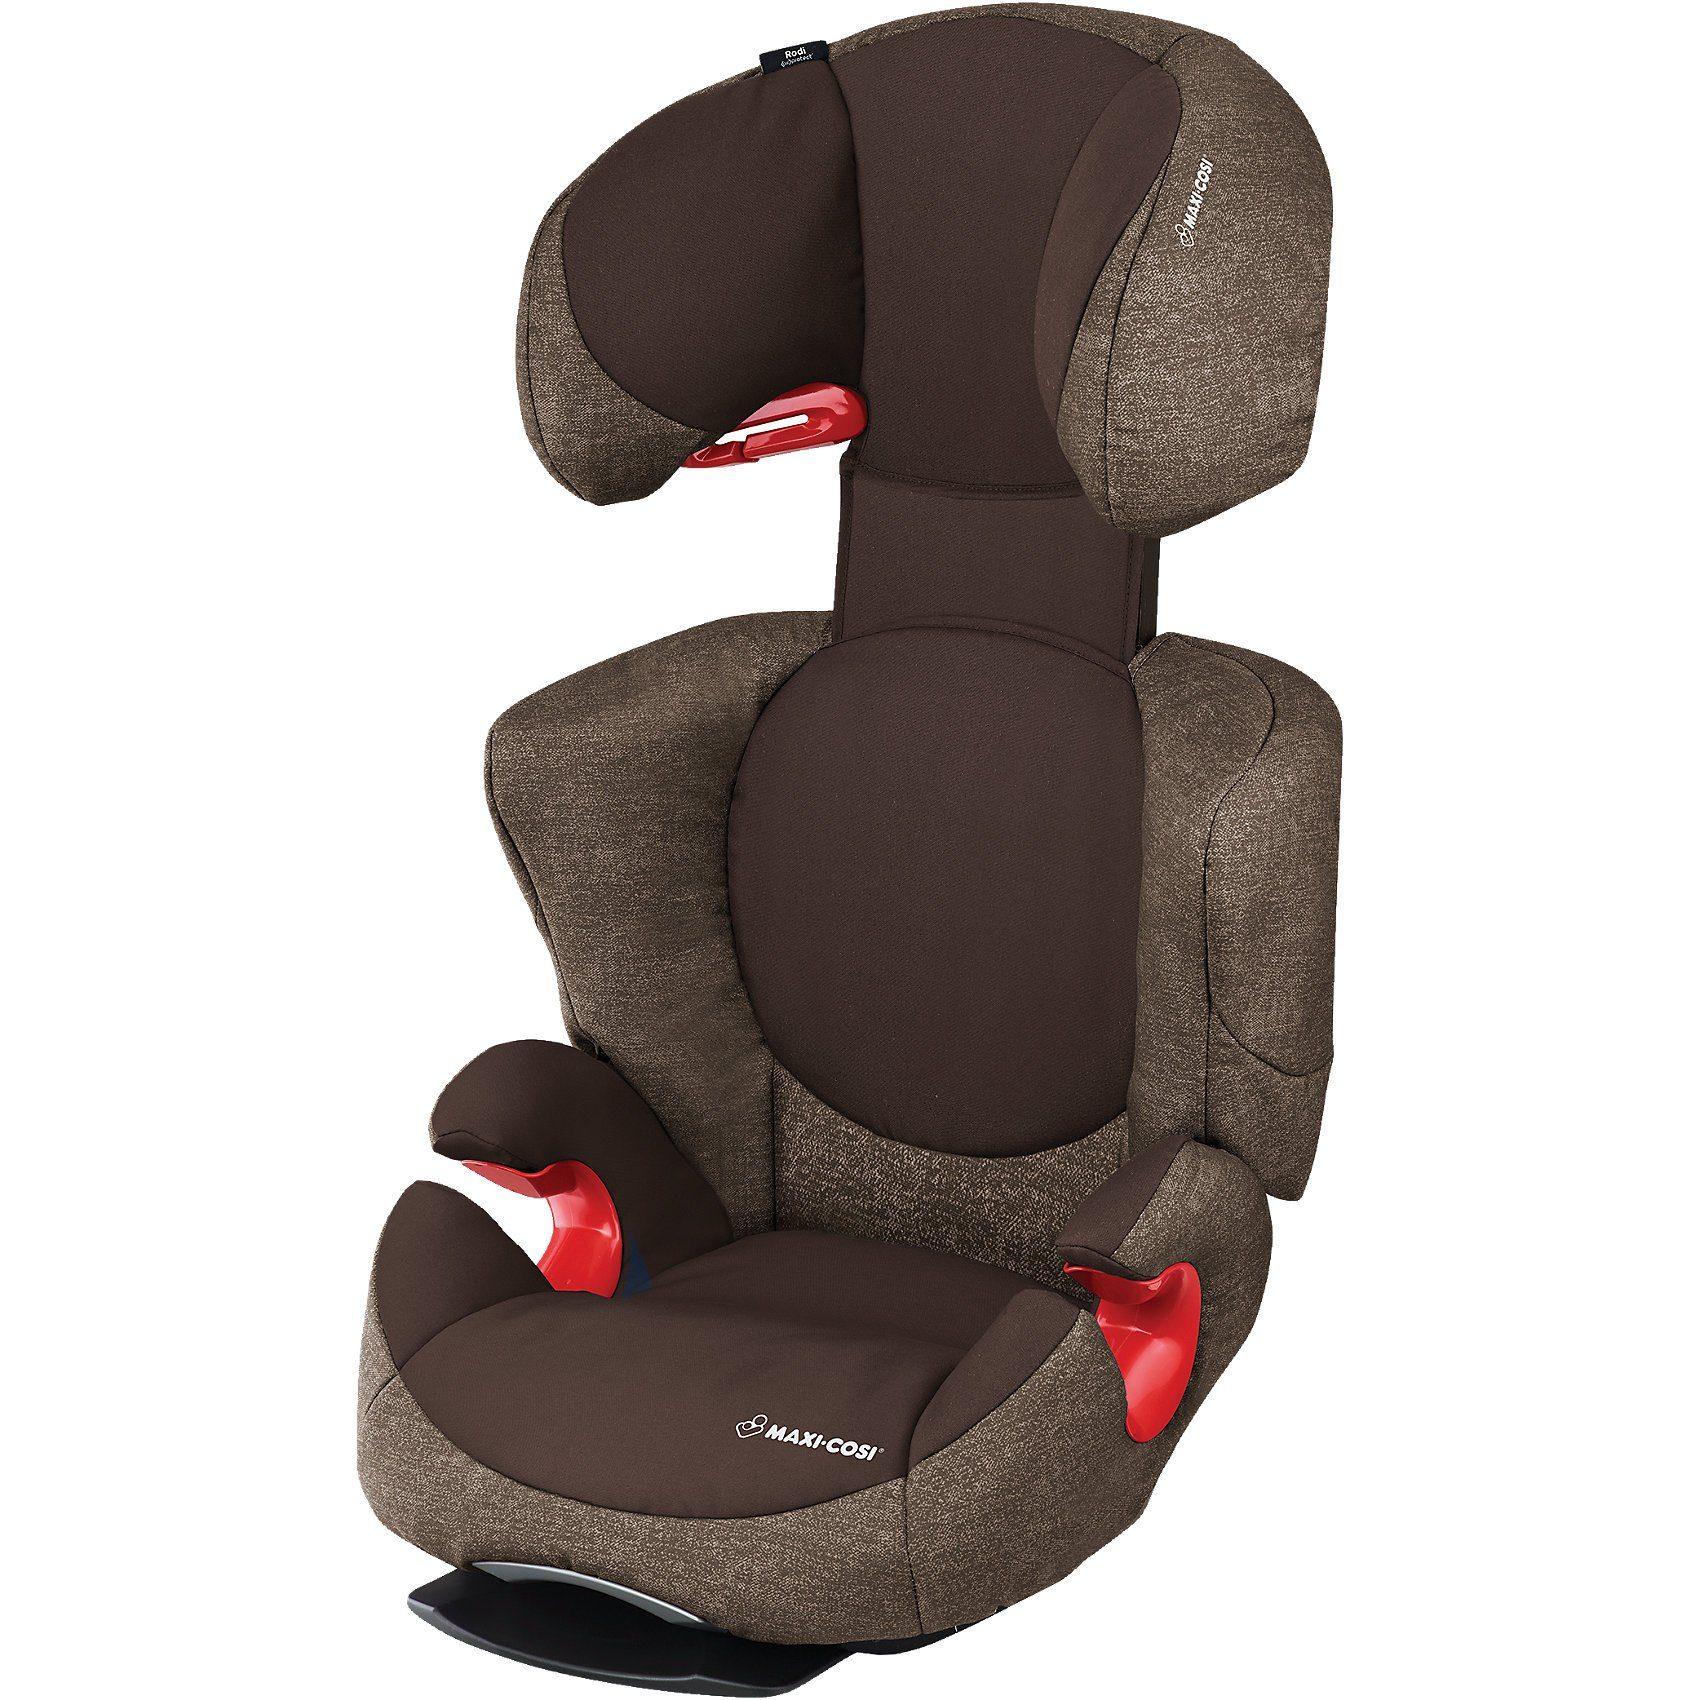 Maxi-Cosi Auto-Kindersitz Rodi AirProtect, Nomad Brown, 2018